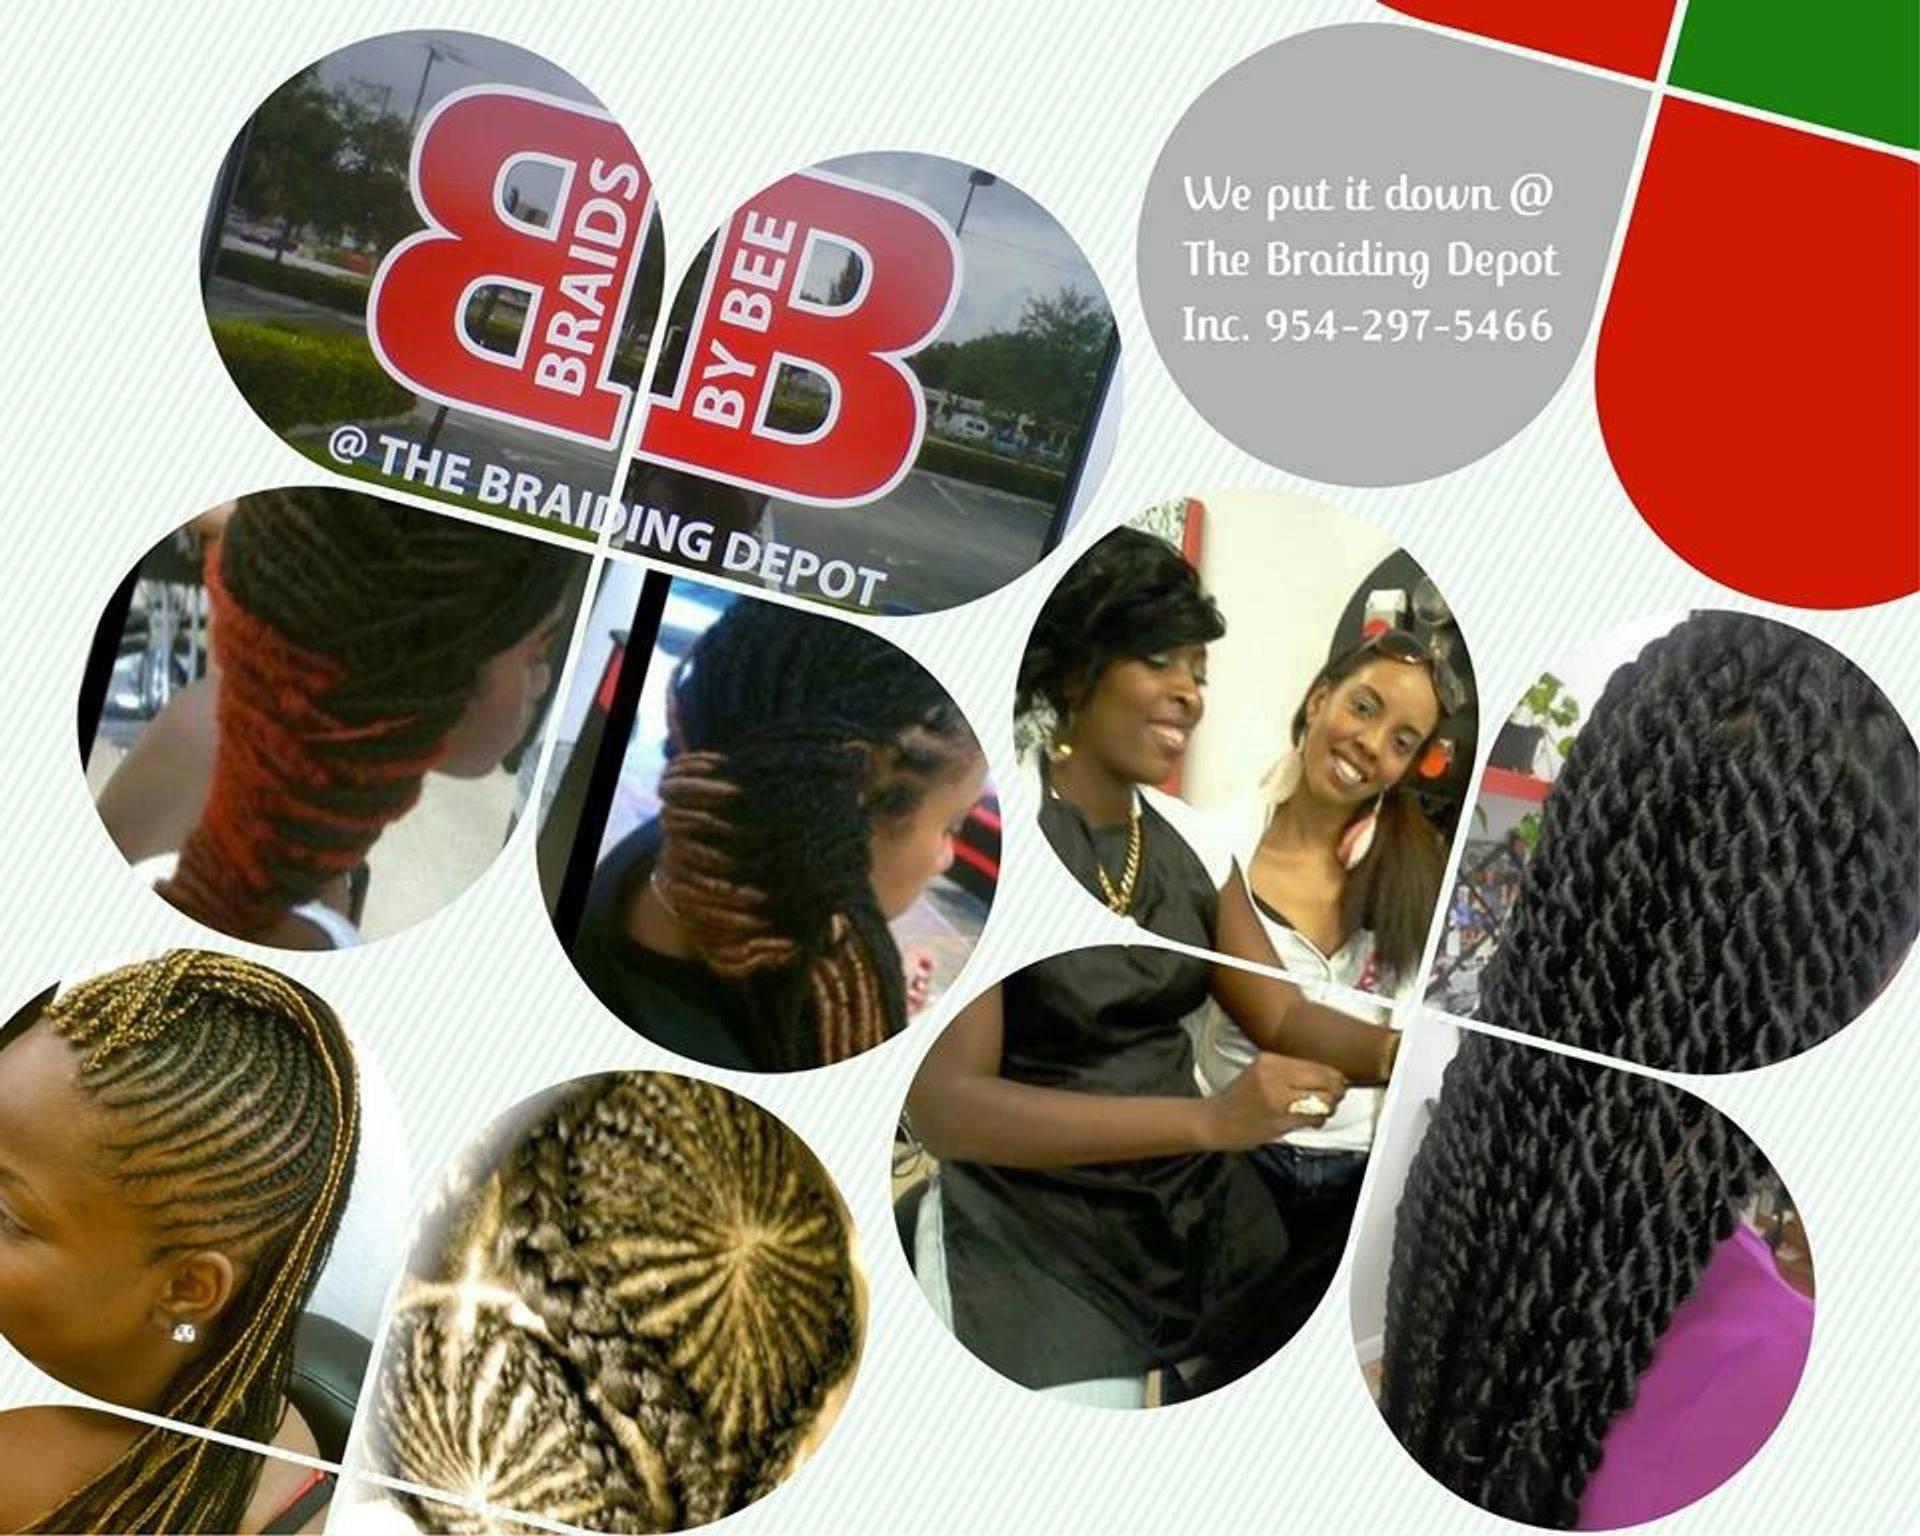 Braids by Bee specialize in design corn row braids.